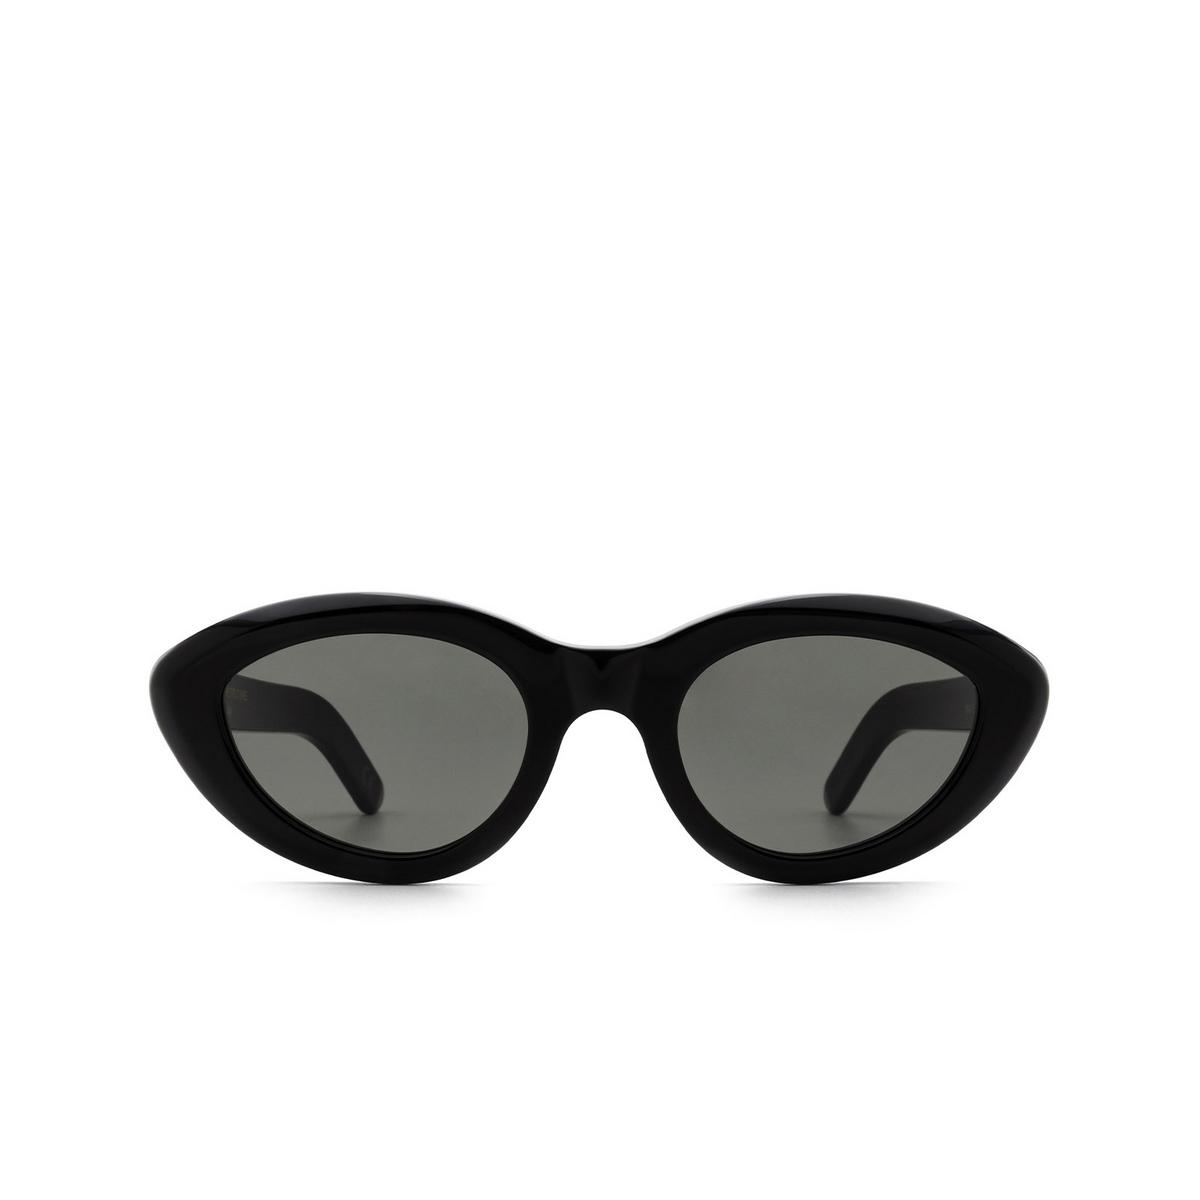 Retrosuperfuture® Cat-eye Sunglasses: Cocca color Black W4A - front view.